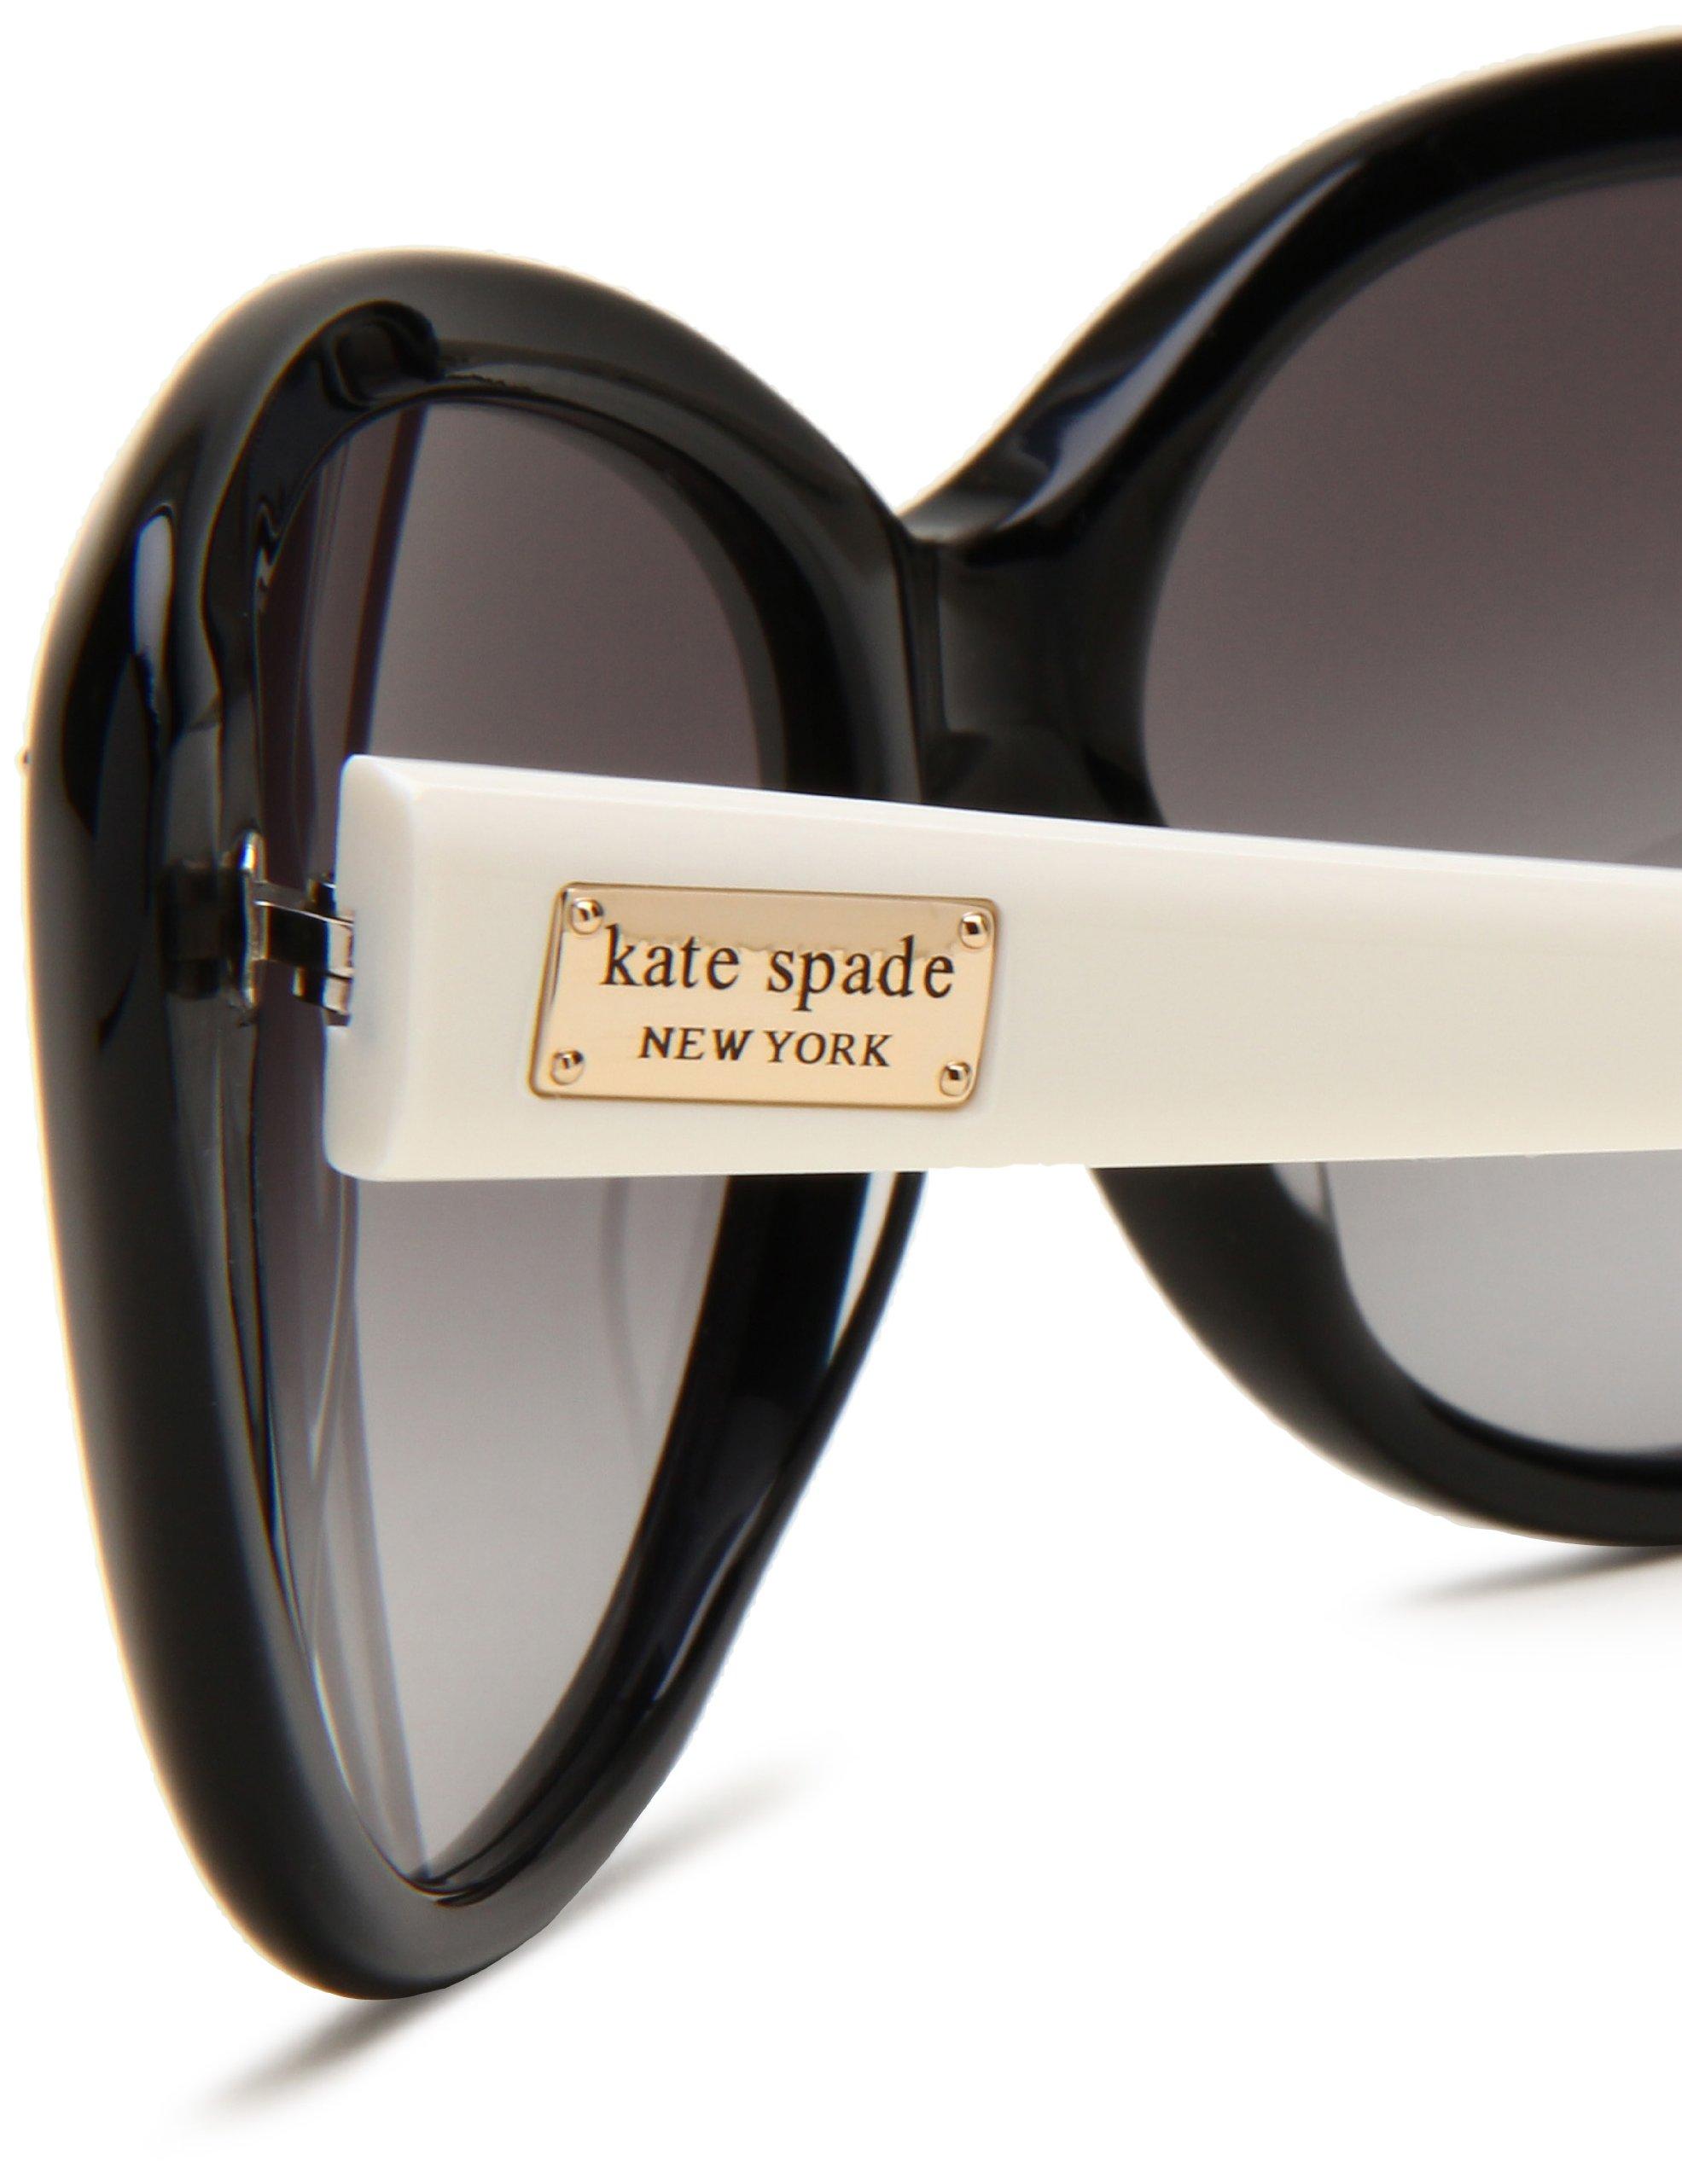 Kate Spade Women's ANGELIQS Cat Eye Sunglasses,Black & Cream Frame/Gray Gradient Lens,One Size by Kate Spade New York (Image #4)